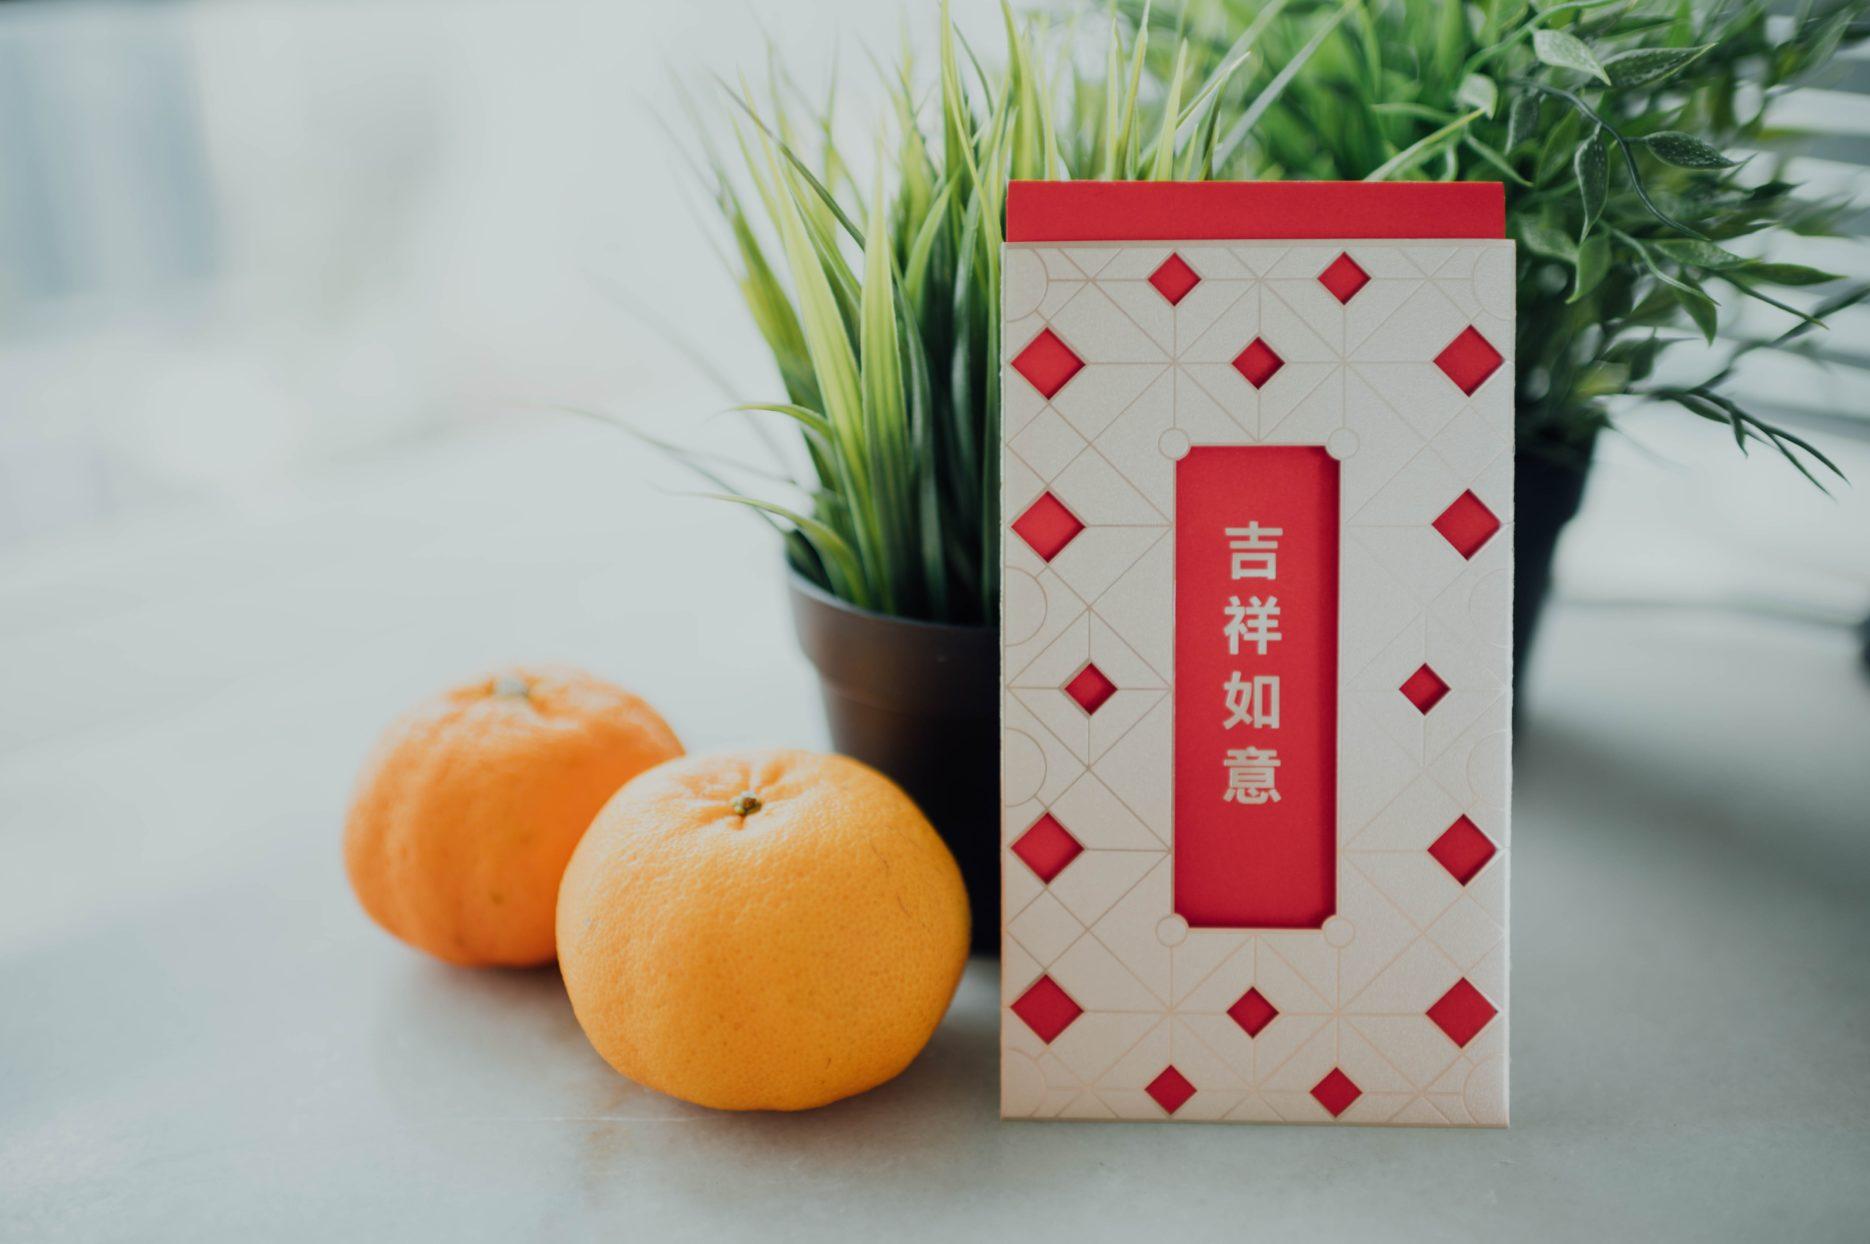 Chinese New Year decorations. Credit: Unsplash